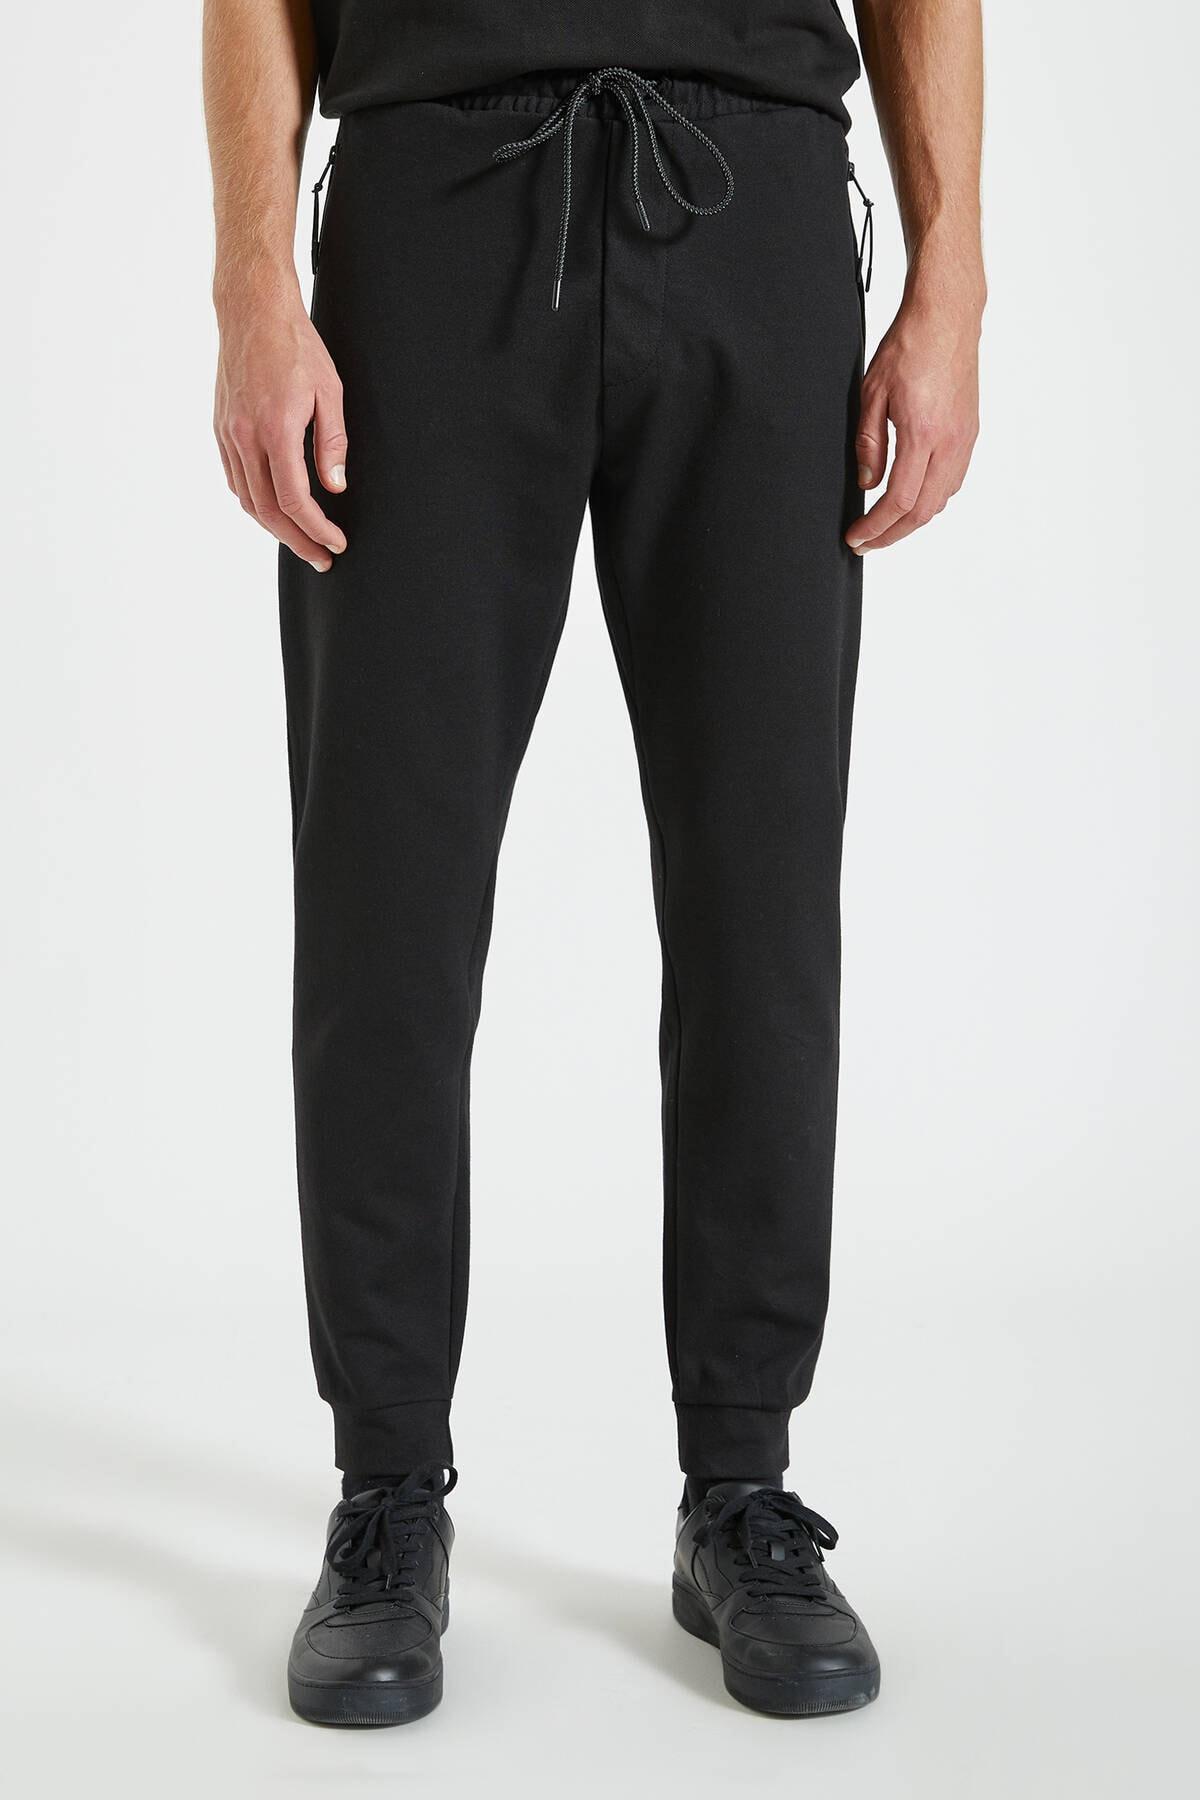 Pull & Bear Erkek Siyah Kontrast Fermuarlı Jogging Fit Pantolon 09678525 2